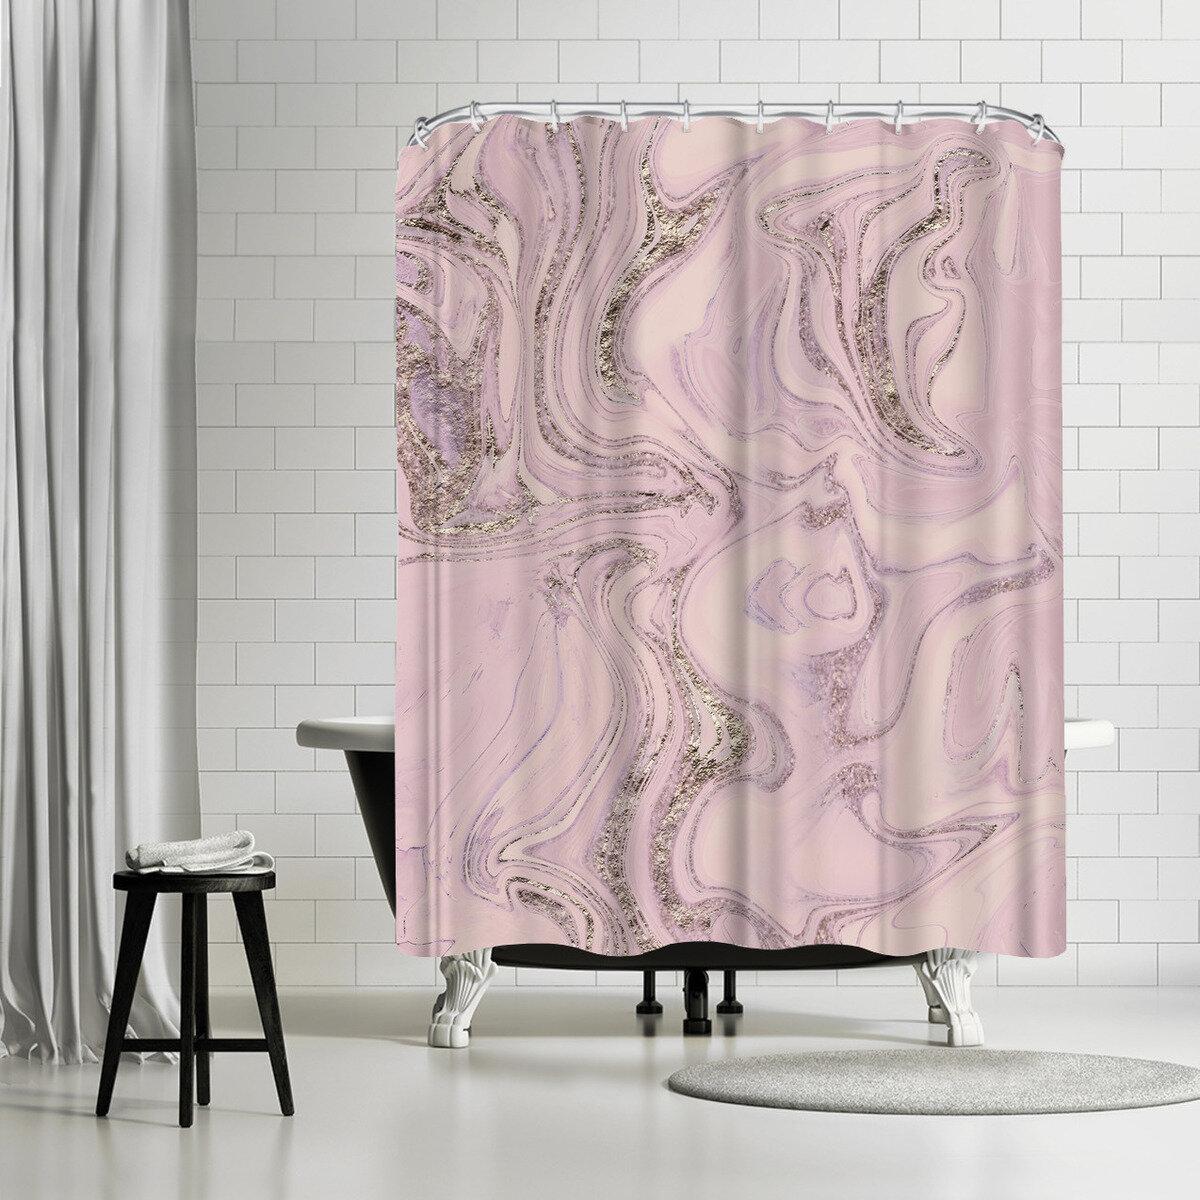 Details About East Urban Home Lebens Art Marble Glitter Shower Curtain